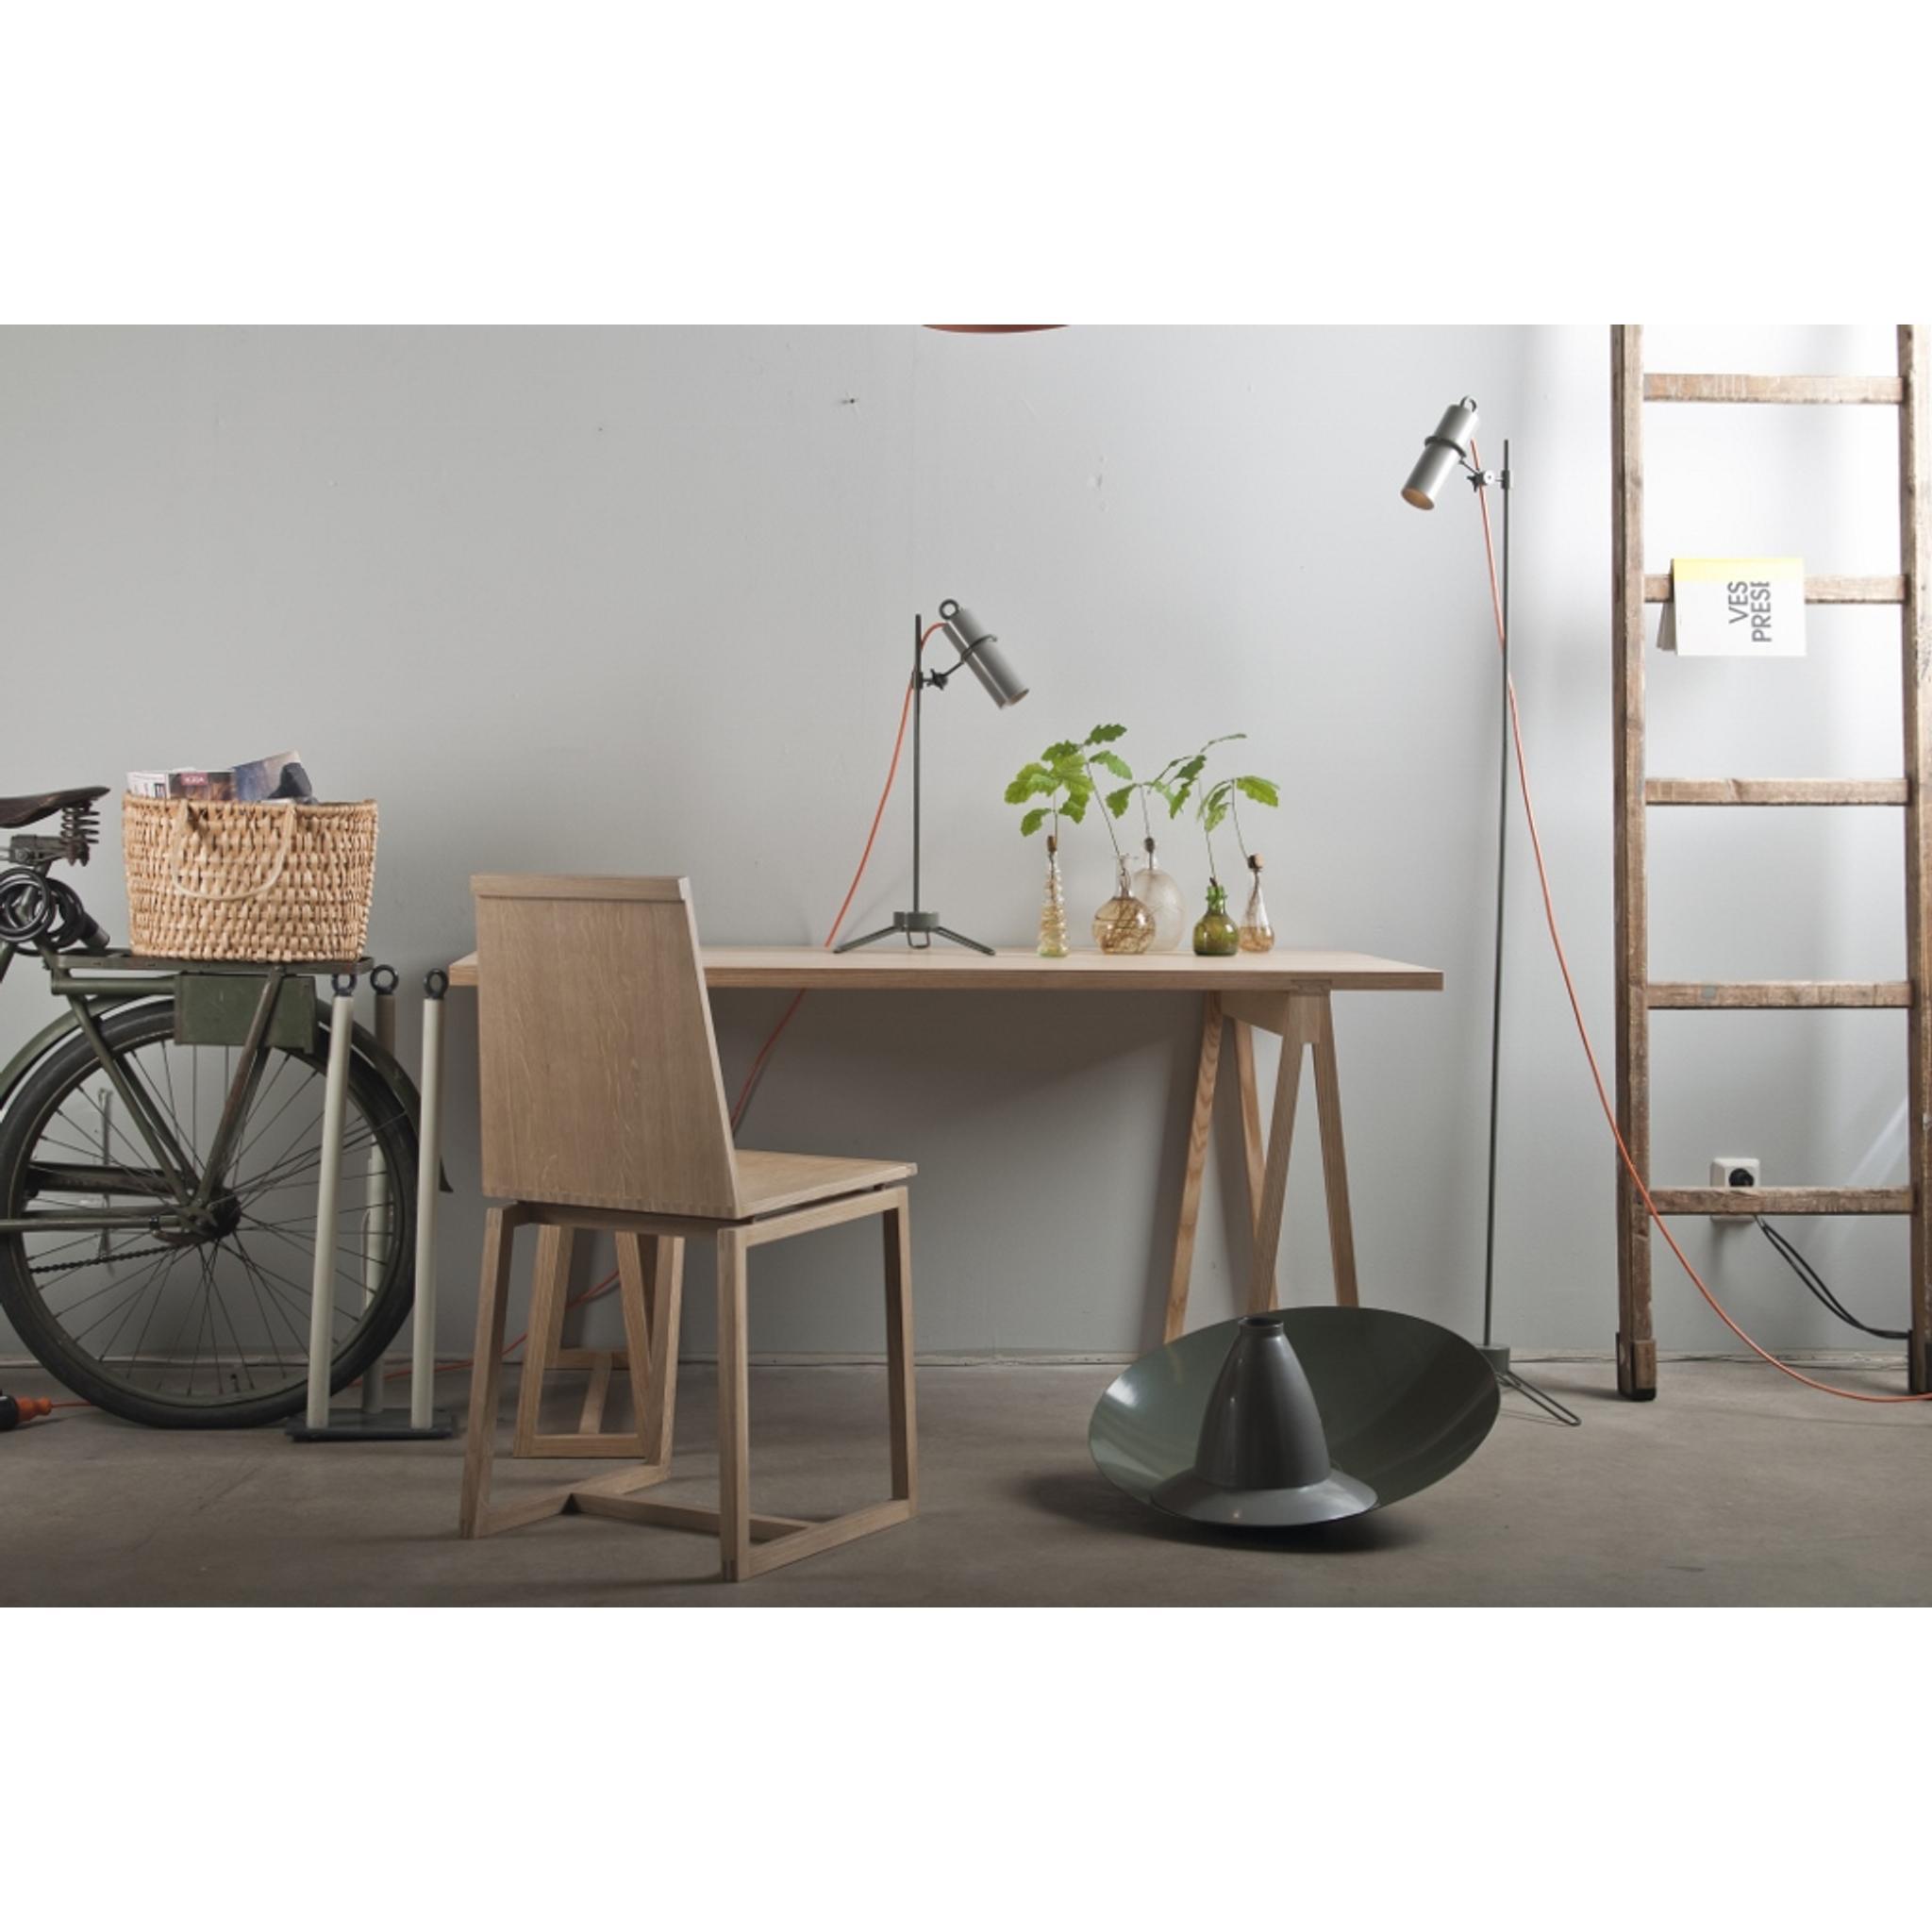 Stehlampe im industriedesign f r led halogen lampen for Sofa industriedesign